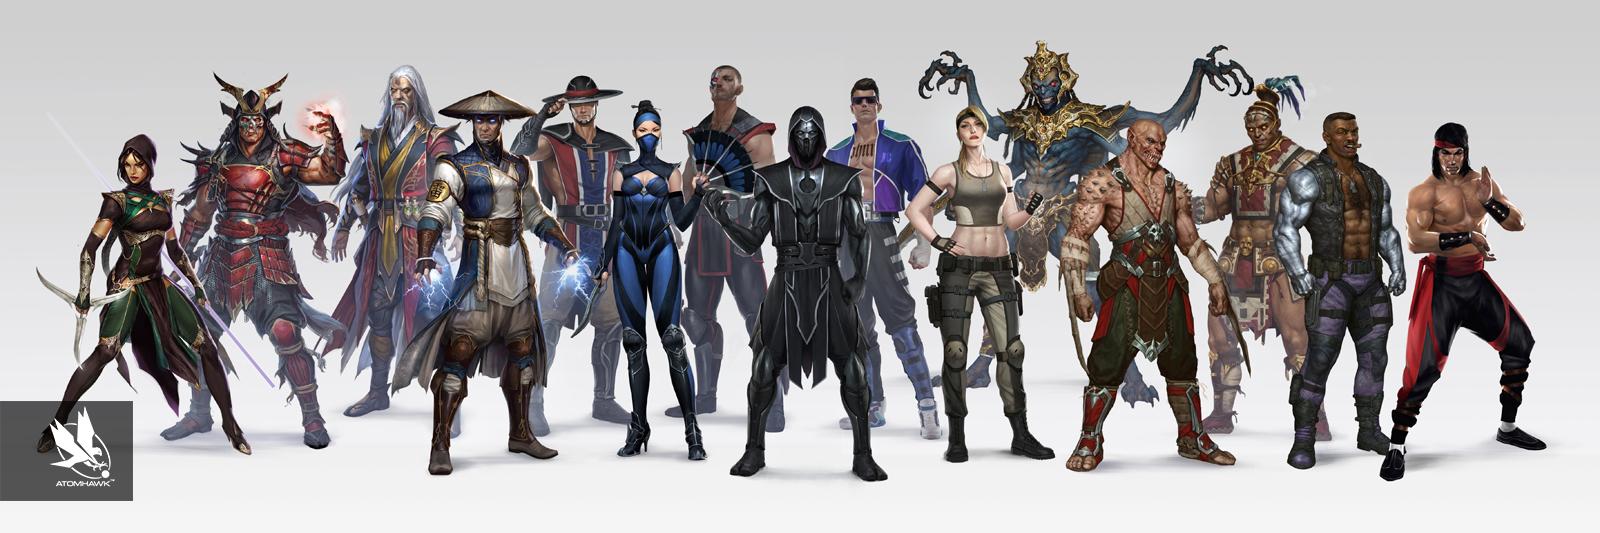 Atomhawk_Warner-Bros-NetherRealm_Mortal-Kombat-11_Concept-Art_Character-Design_Line-Up_Past.jpg